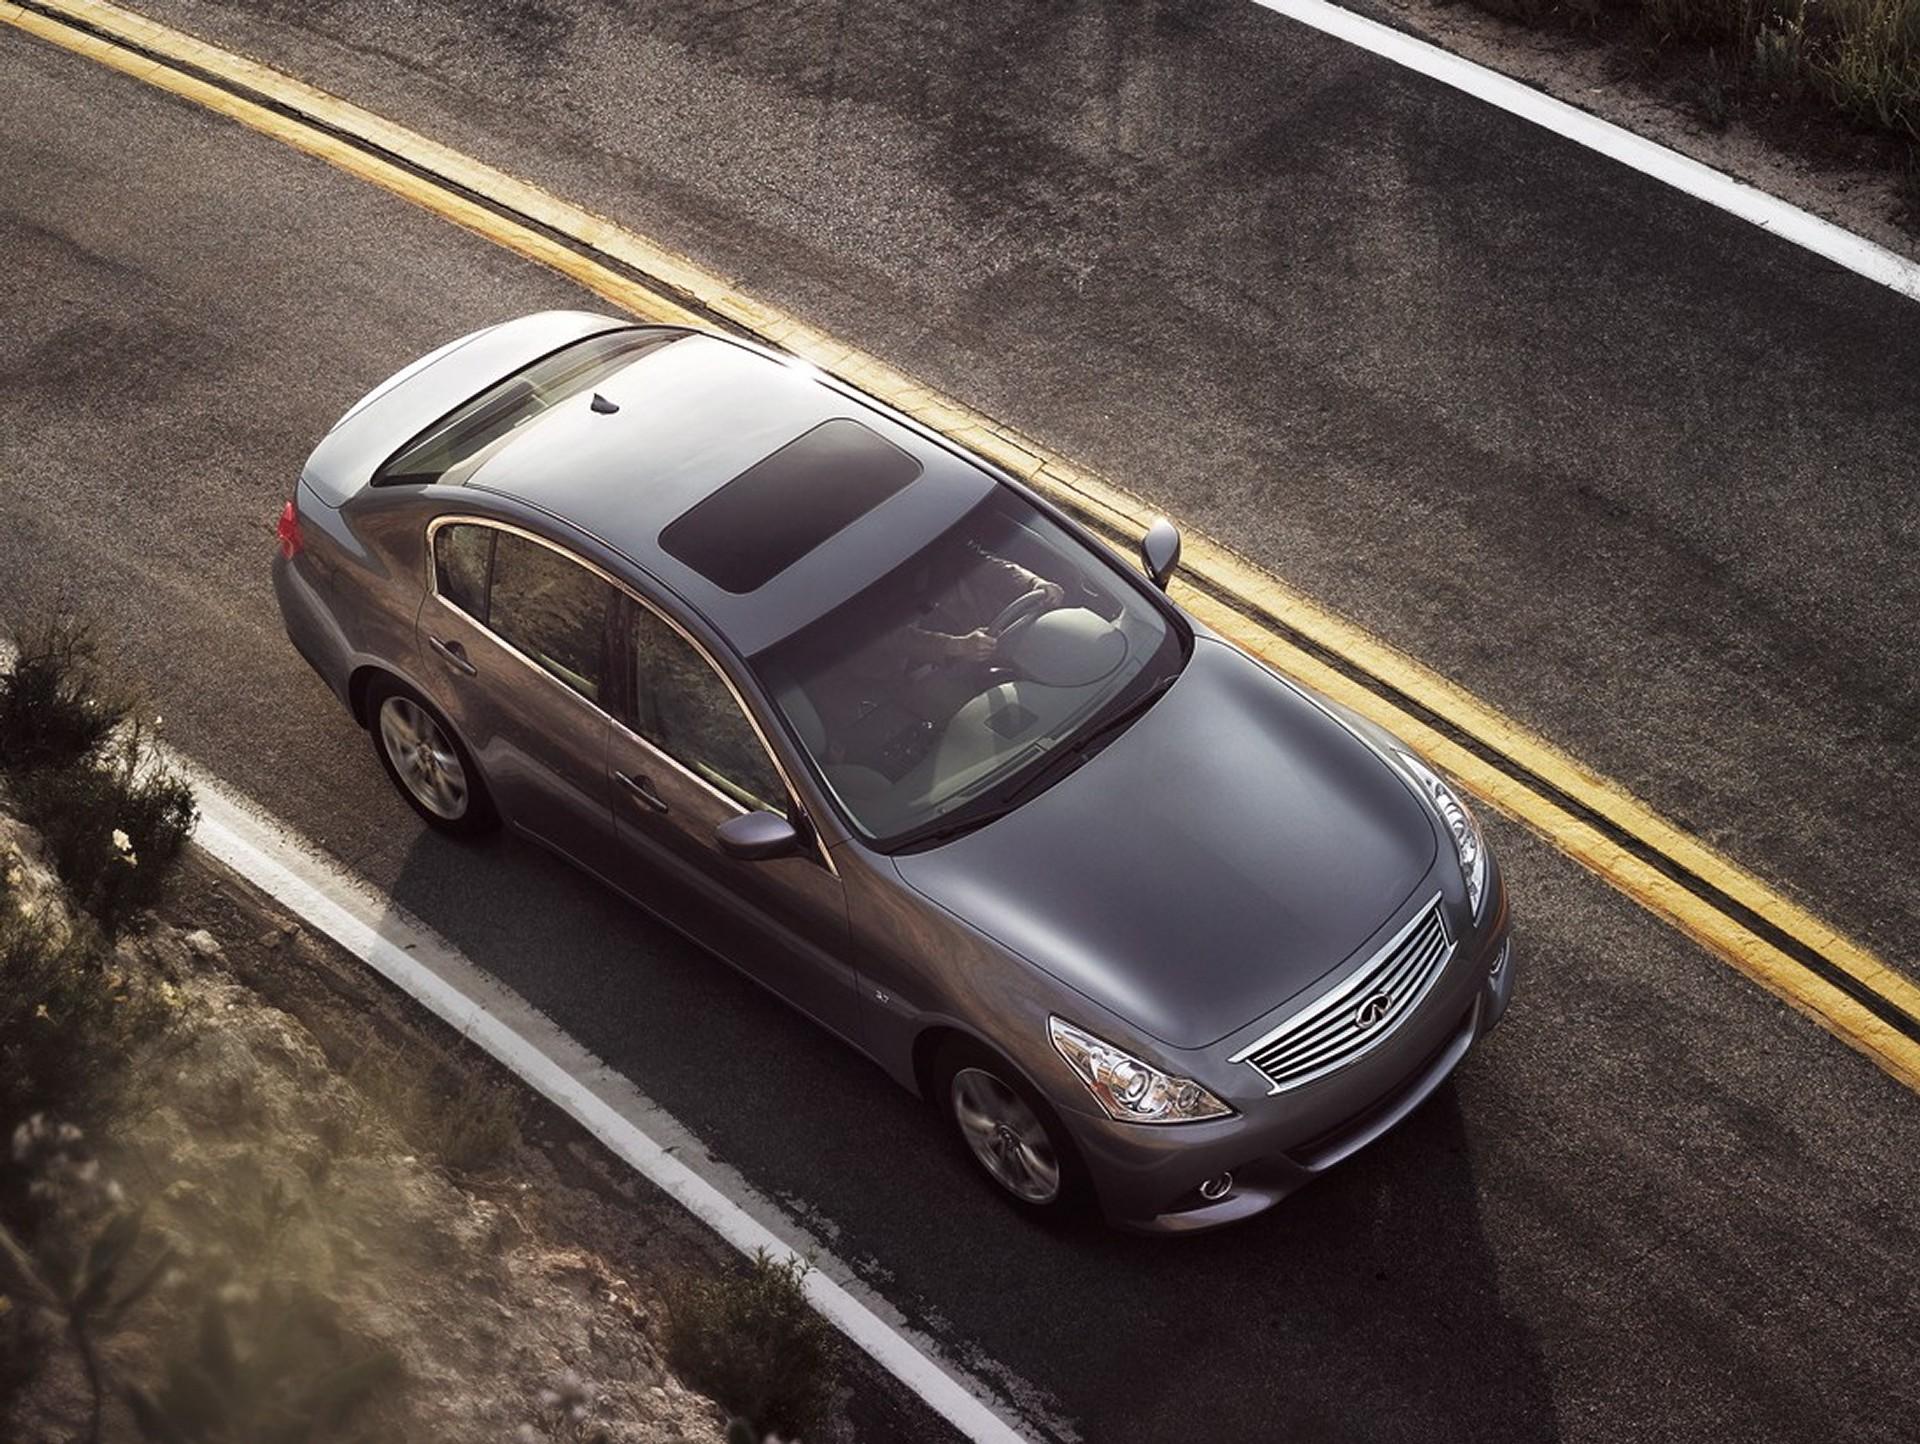 infiniti g37 2015 4 door. 2015 infiniti q40 review ratings specs prices and photos the car connection infiniti g37 4 door